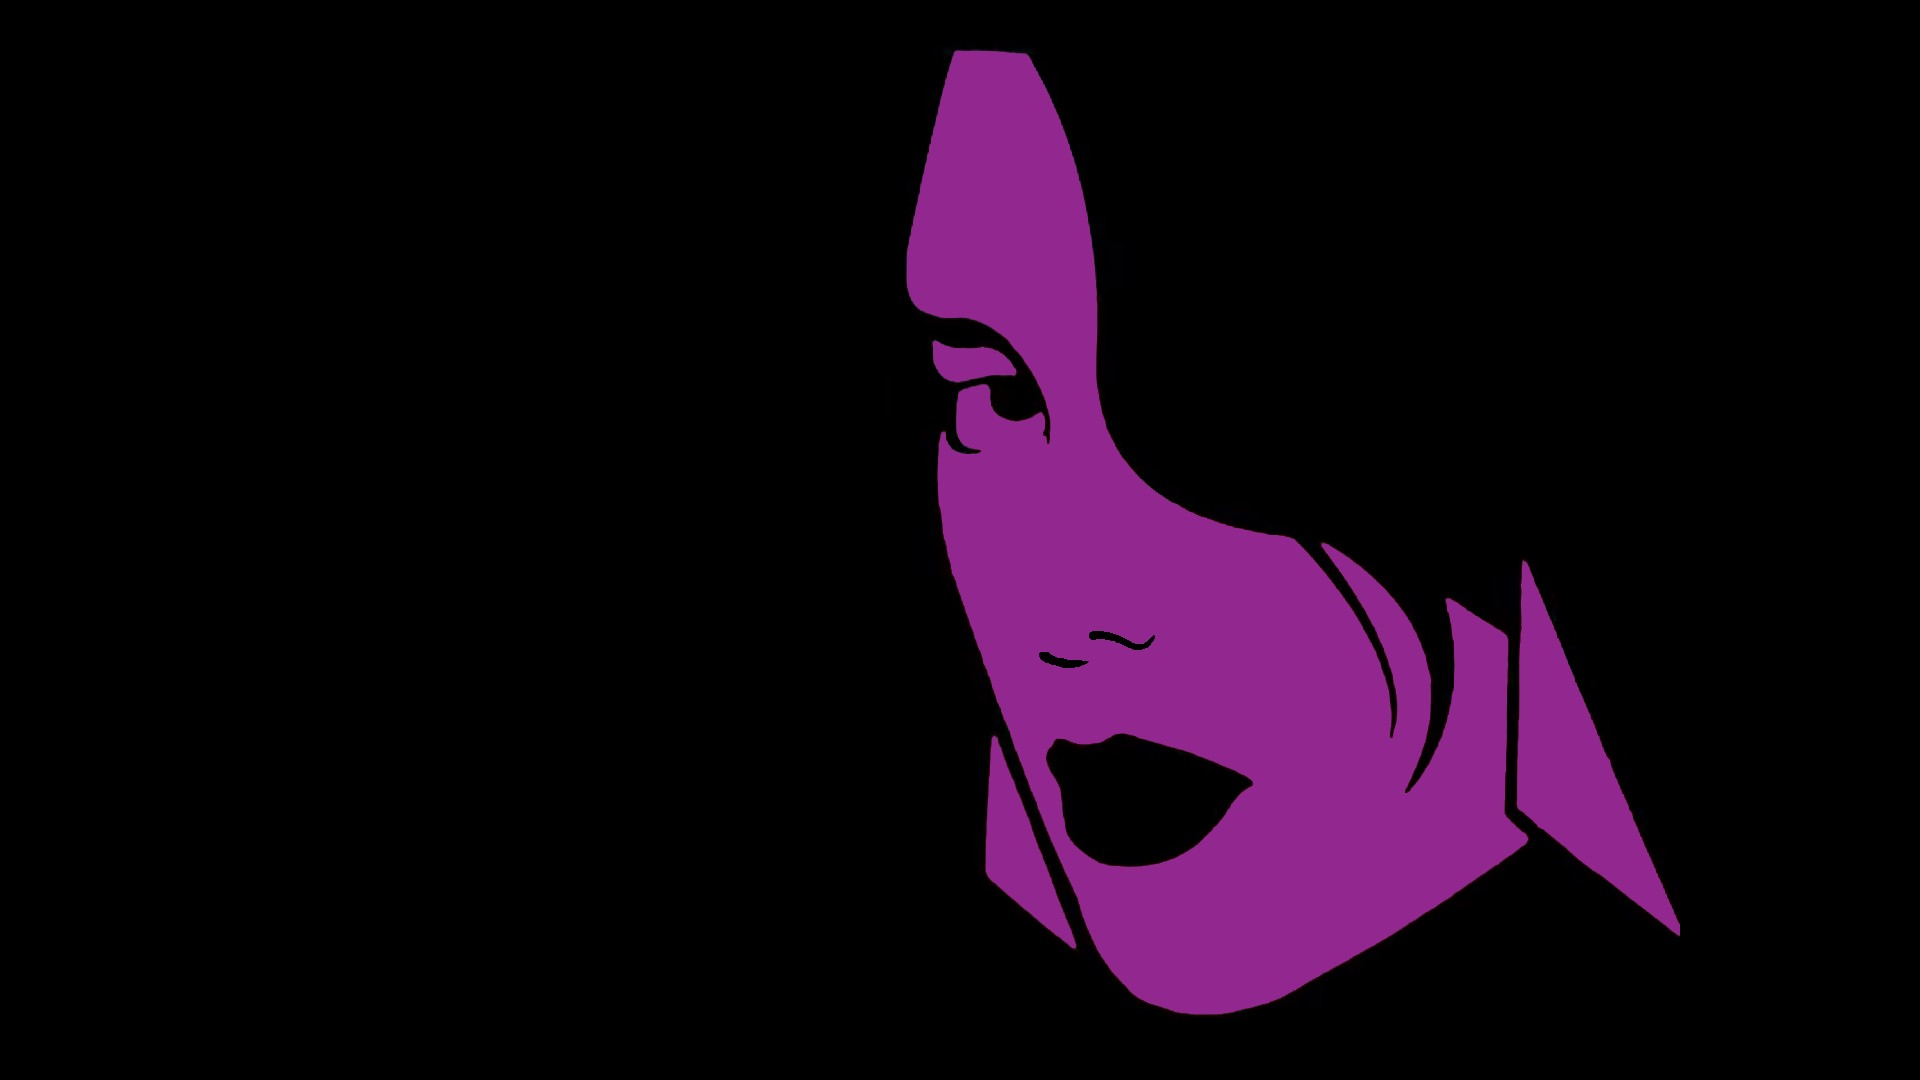 Girl Face Wallpaper 5k Face Women Grand Theft Auto Vice City Minimalism